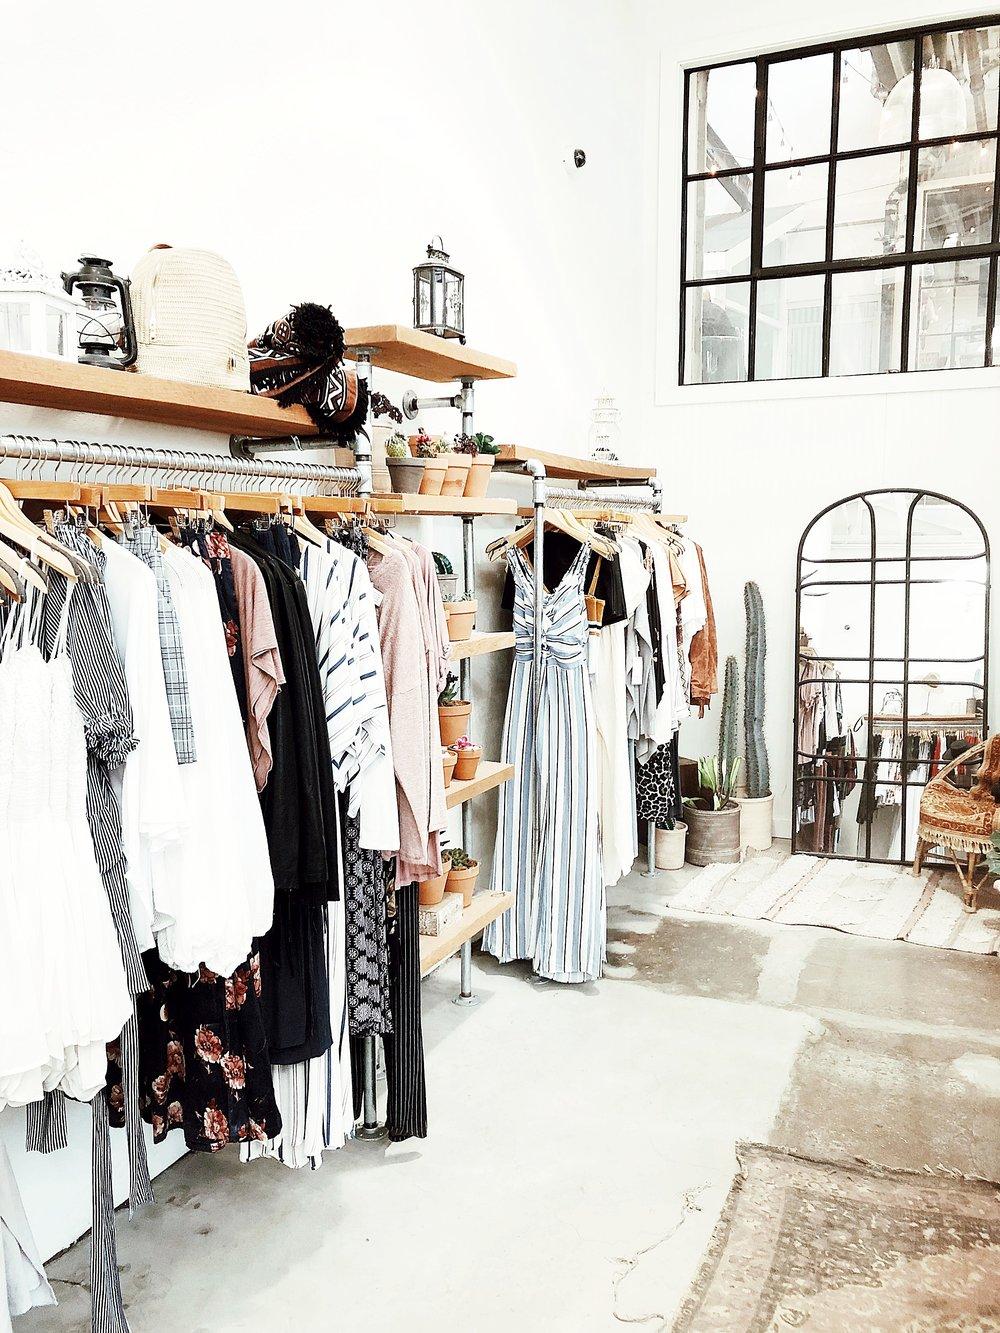 nashville-guide-bachelorette-where-to-shop-best-boutique-american-threads.jpg